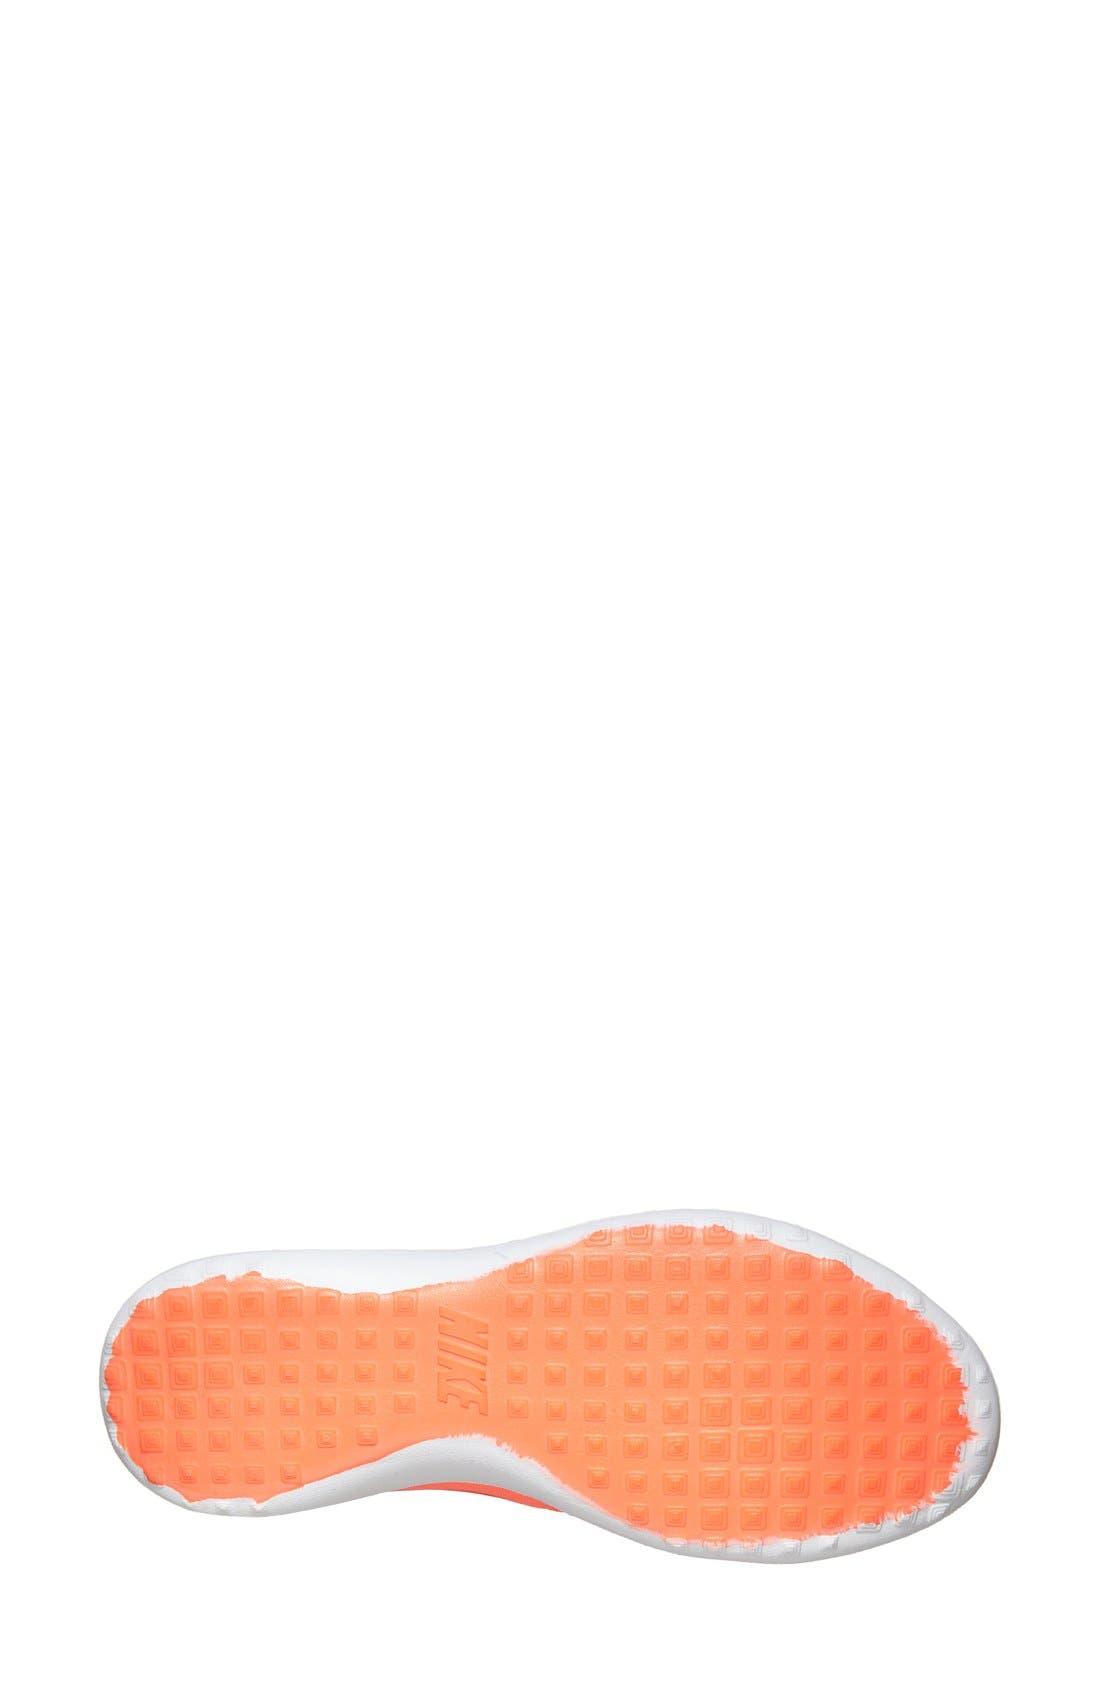 ,                             'Juvenate' Sneaker,                             Alternate thumbnail 293, color,                             800